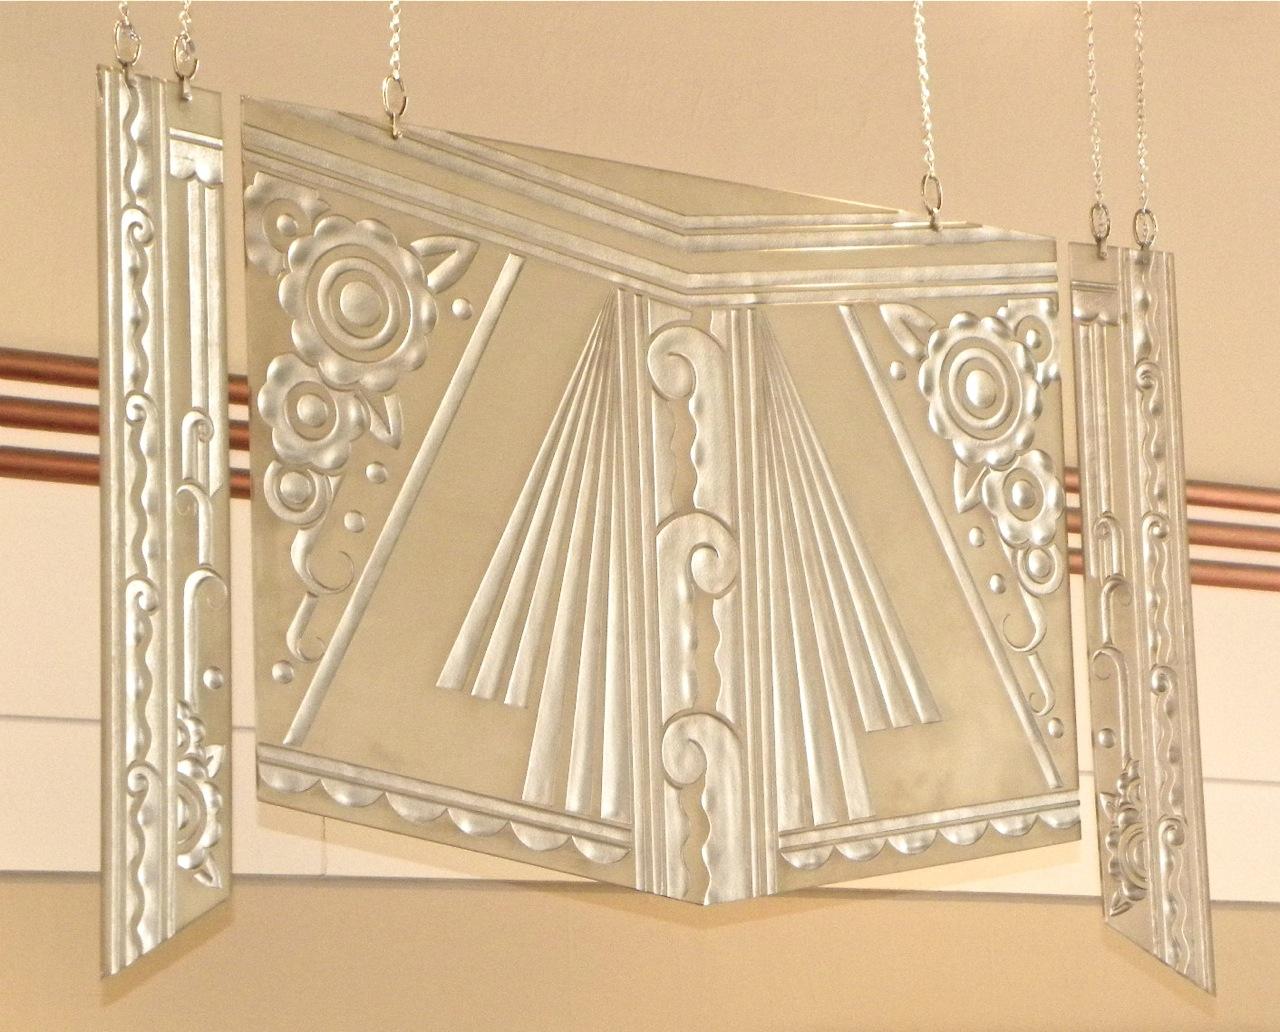 1930s art deco glass triptych sold items glass art. Black Bedroom Furniture Sets. Home Design Ideas